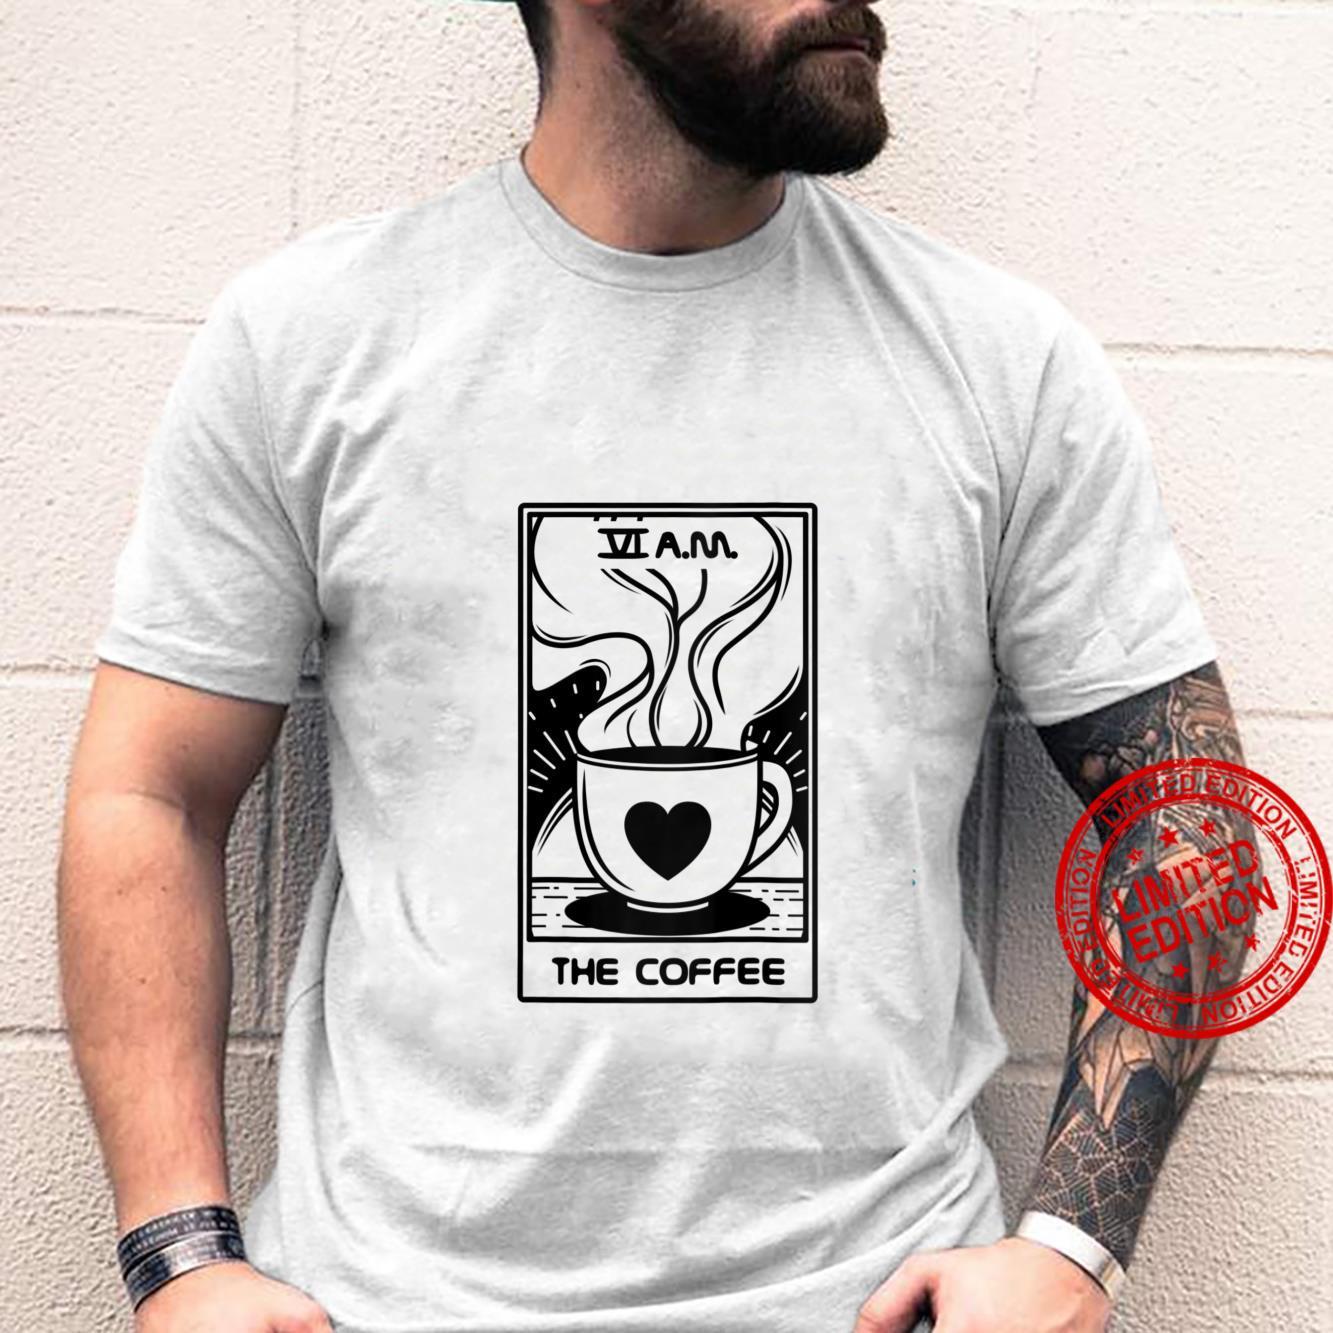 Womens Tarot Card Shirt The Coffee Witchy Shirt Coffee Shirt